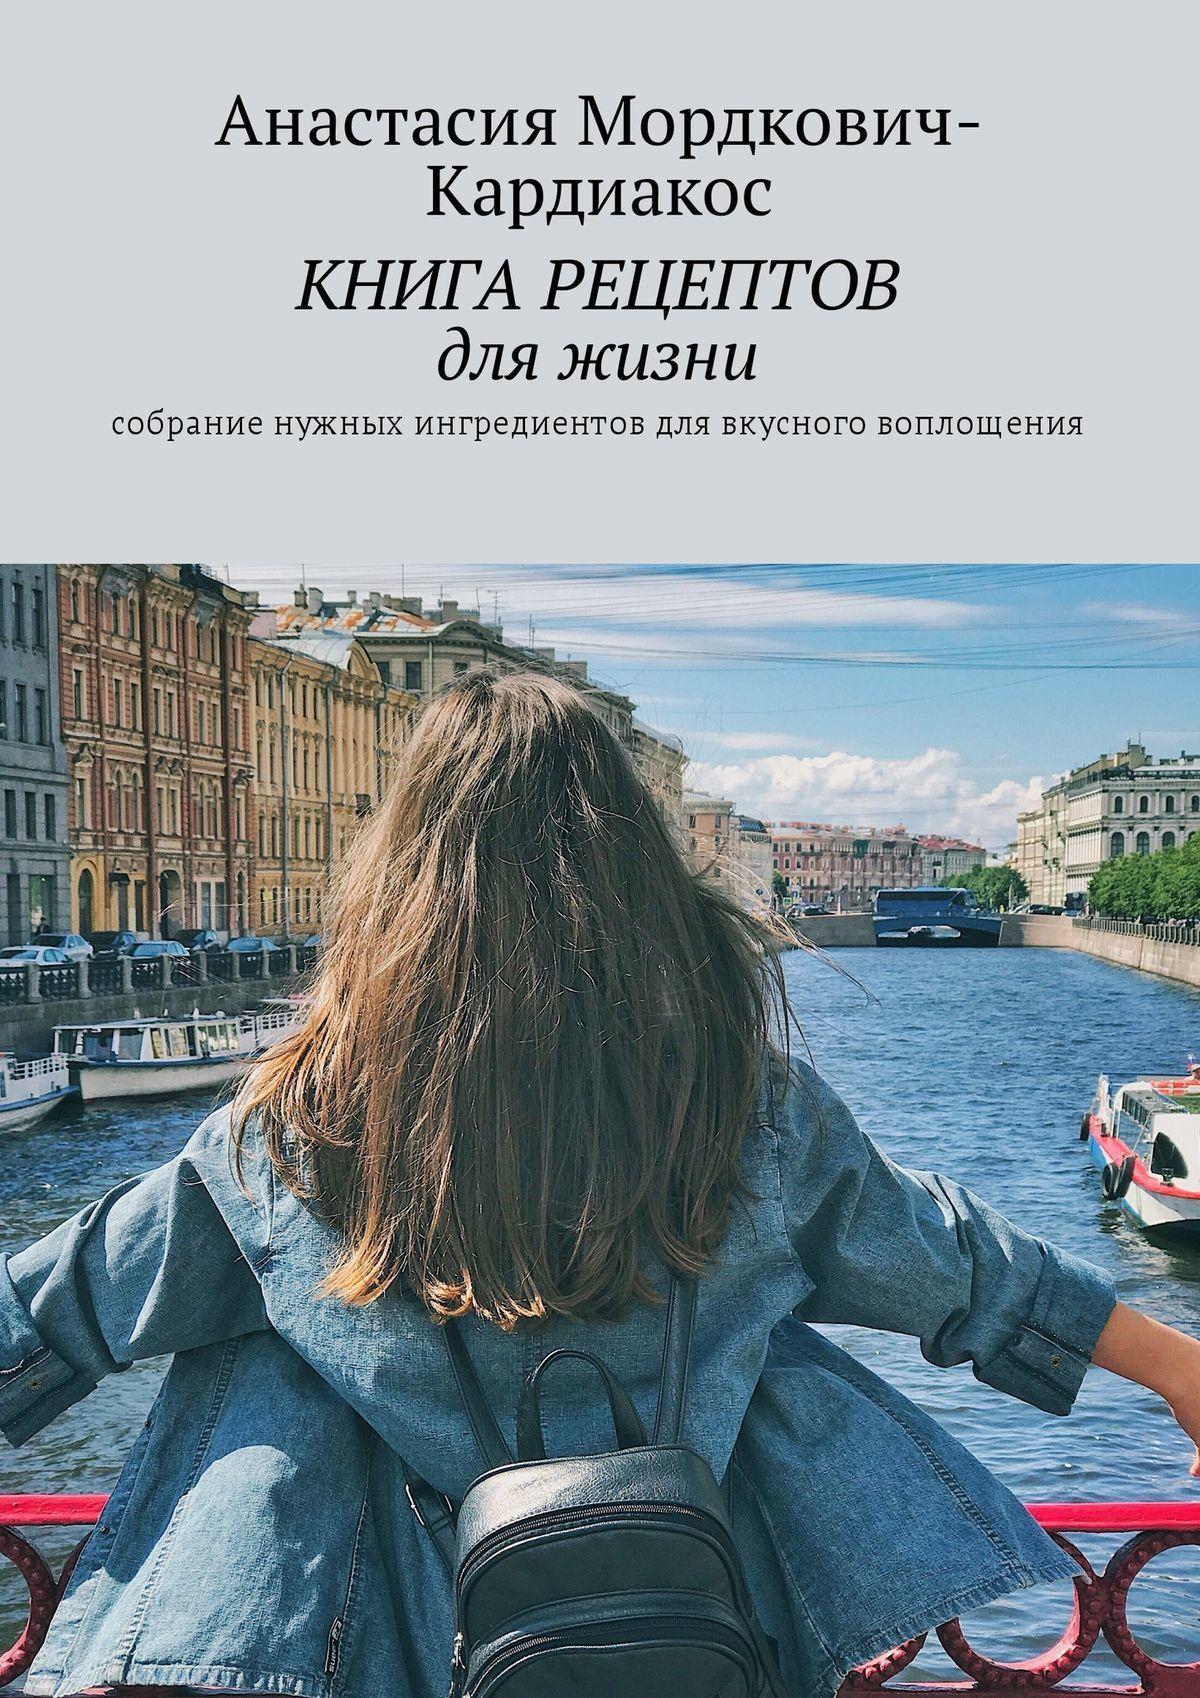 Анастасия Мордкович-Кардиакос бесплатно